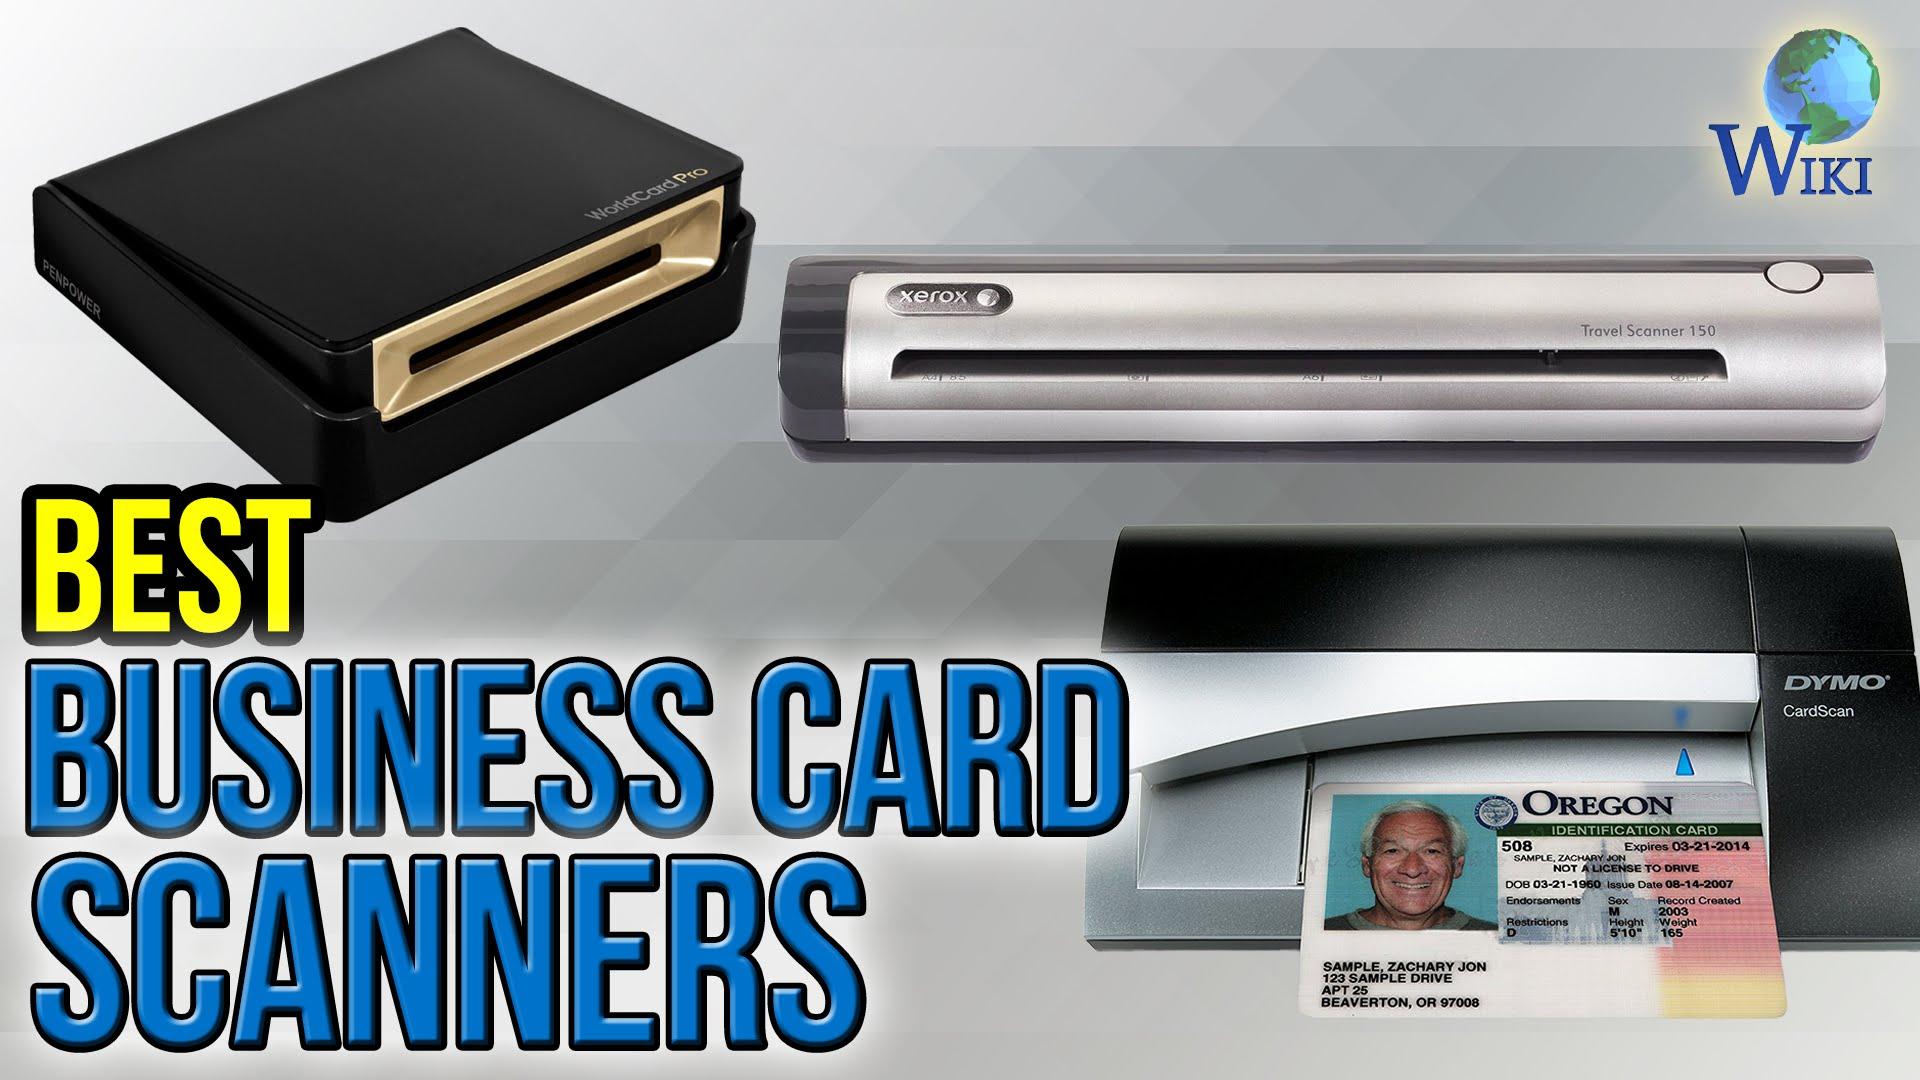 Download Best Free Smart Business Card Reader Apps (NFC, Rfid